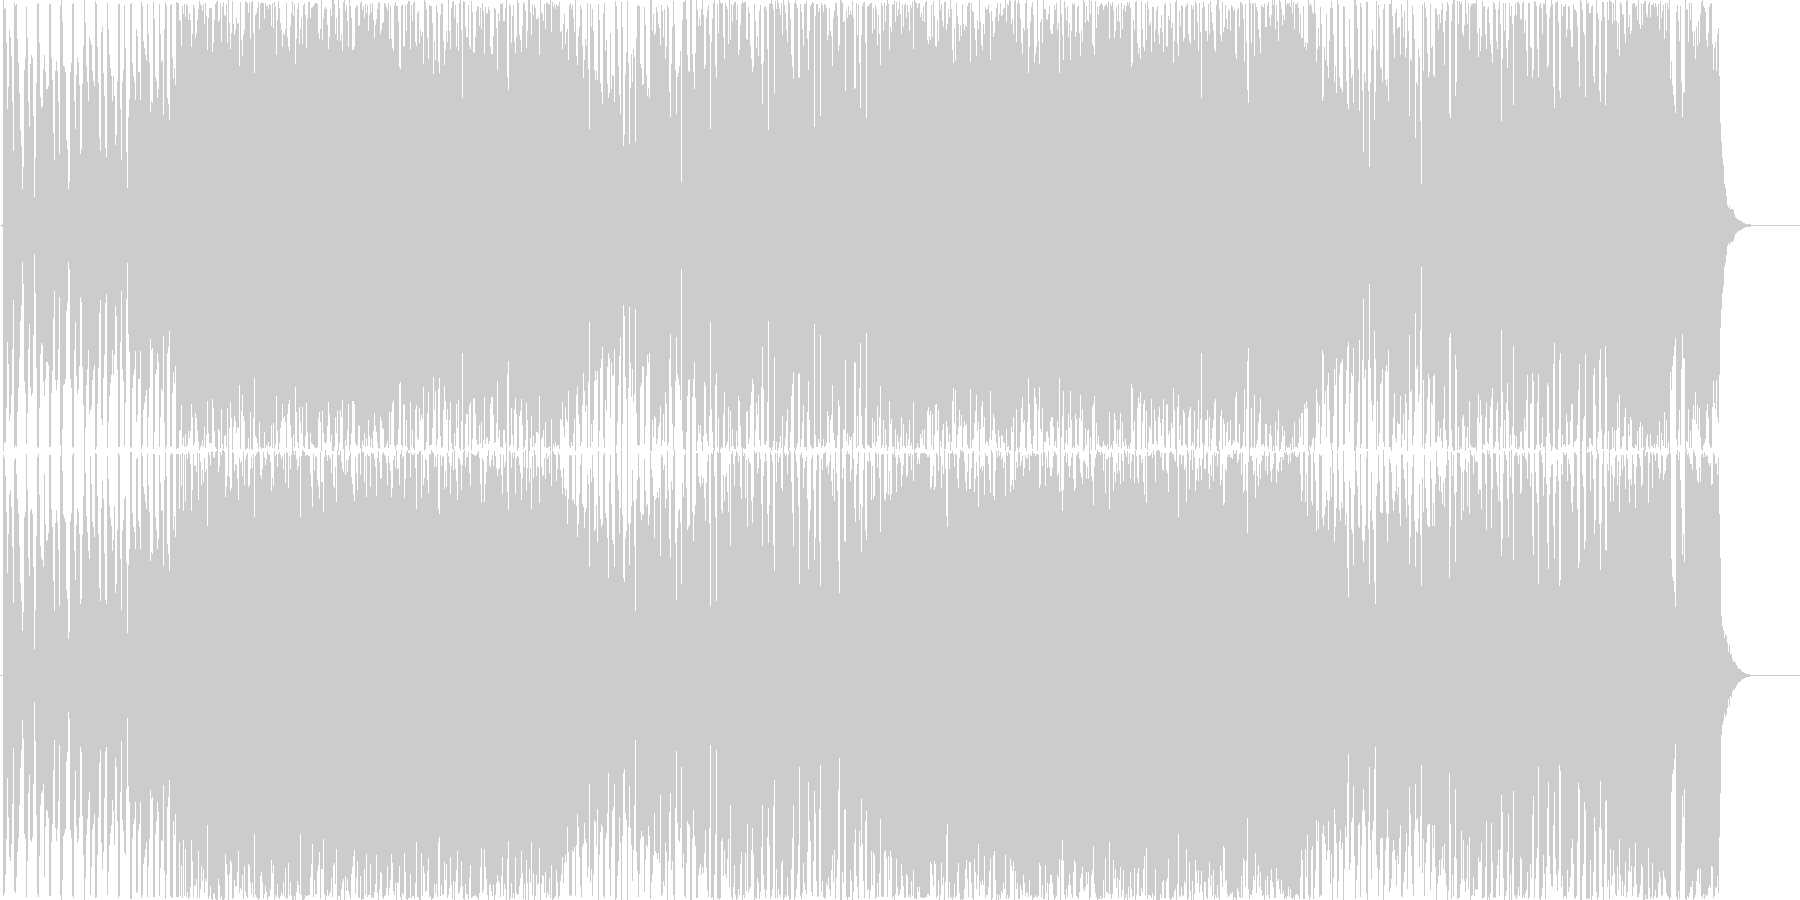 E.Guiterで夏イメージしたrockの未再生の波形